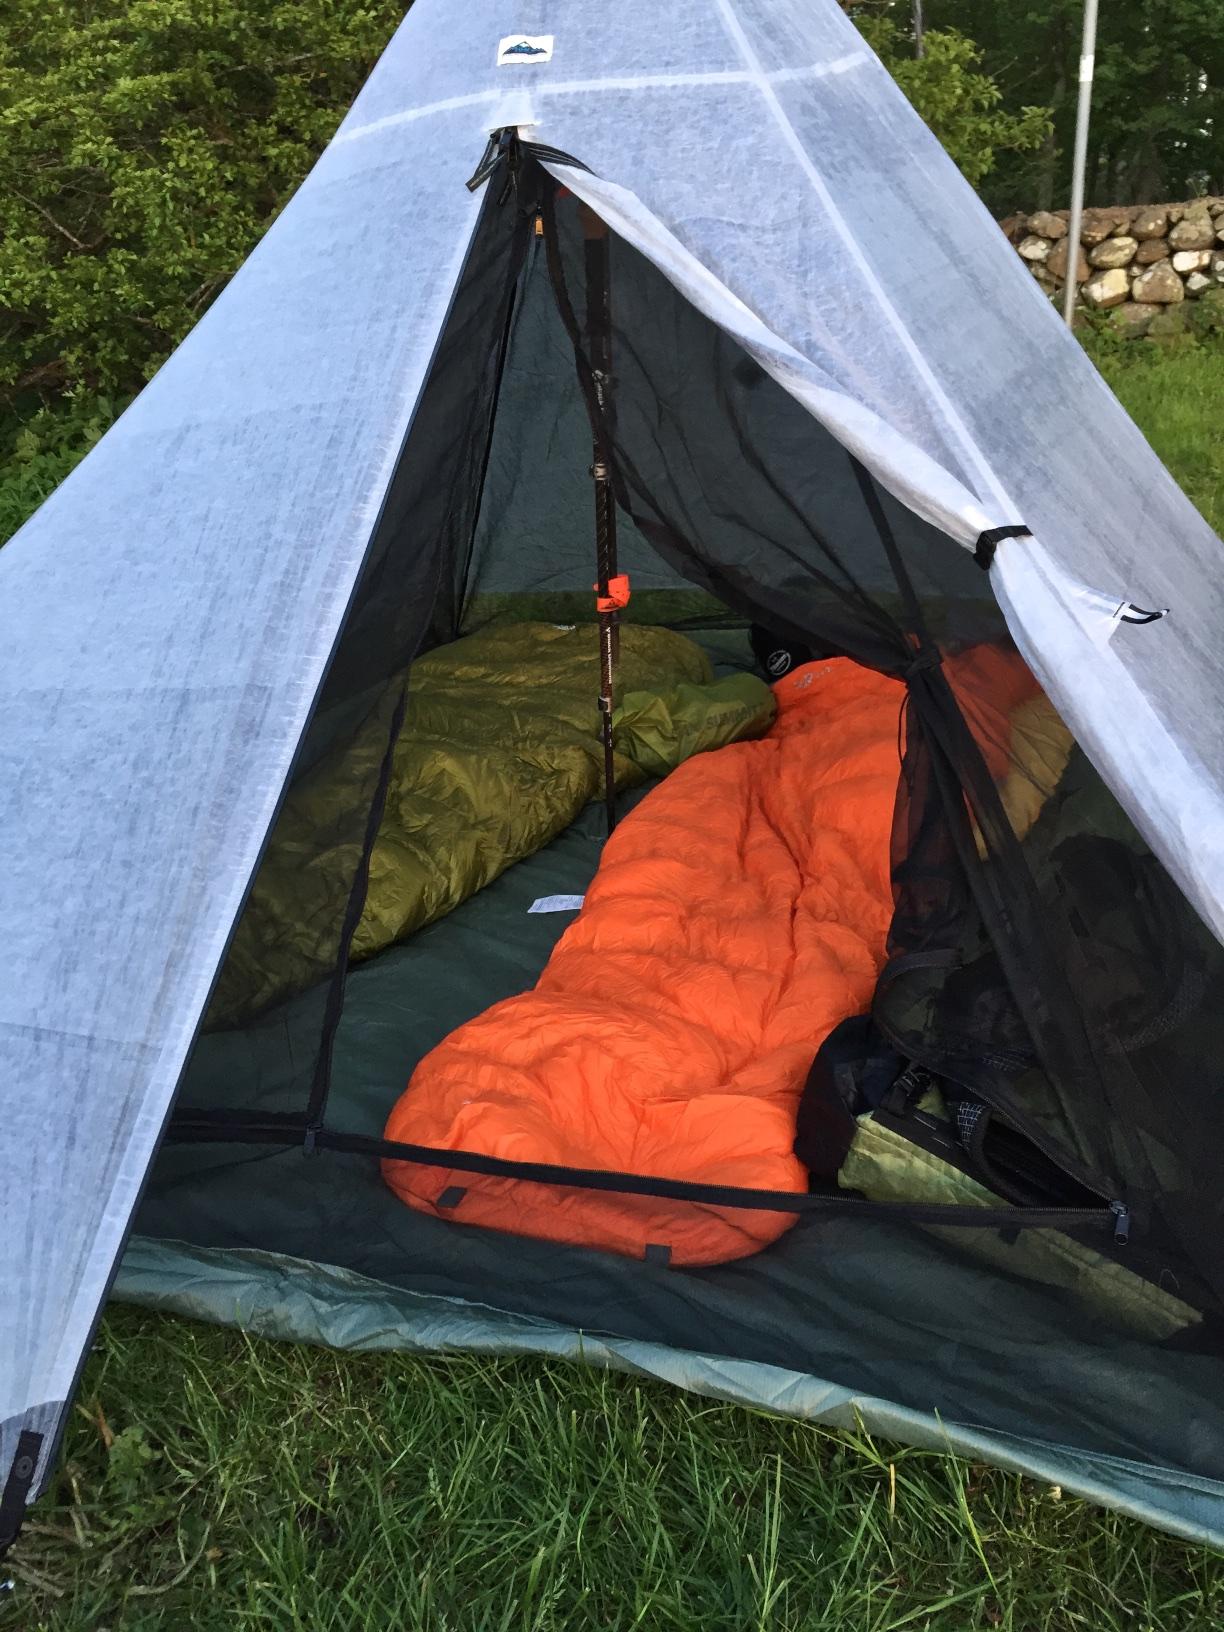 Bearpawwd PyraNet 2 inside my HMG UltaMid 2 tent. & tent | Lighter Packs | Page 2